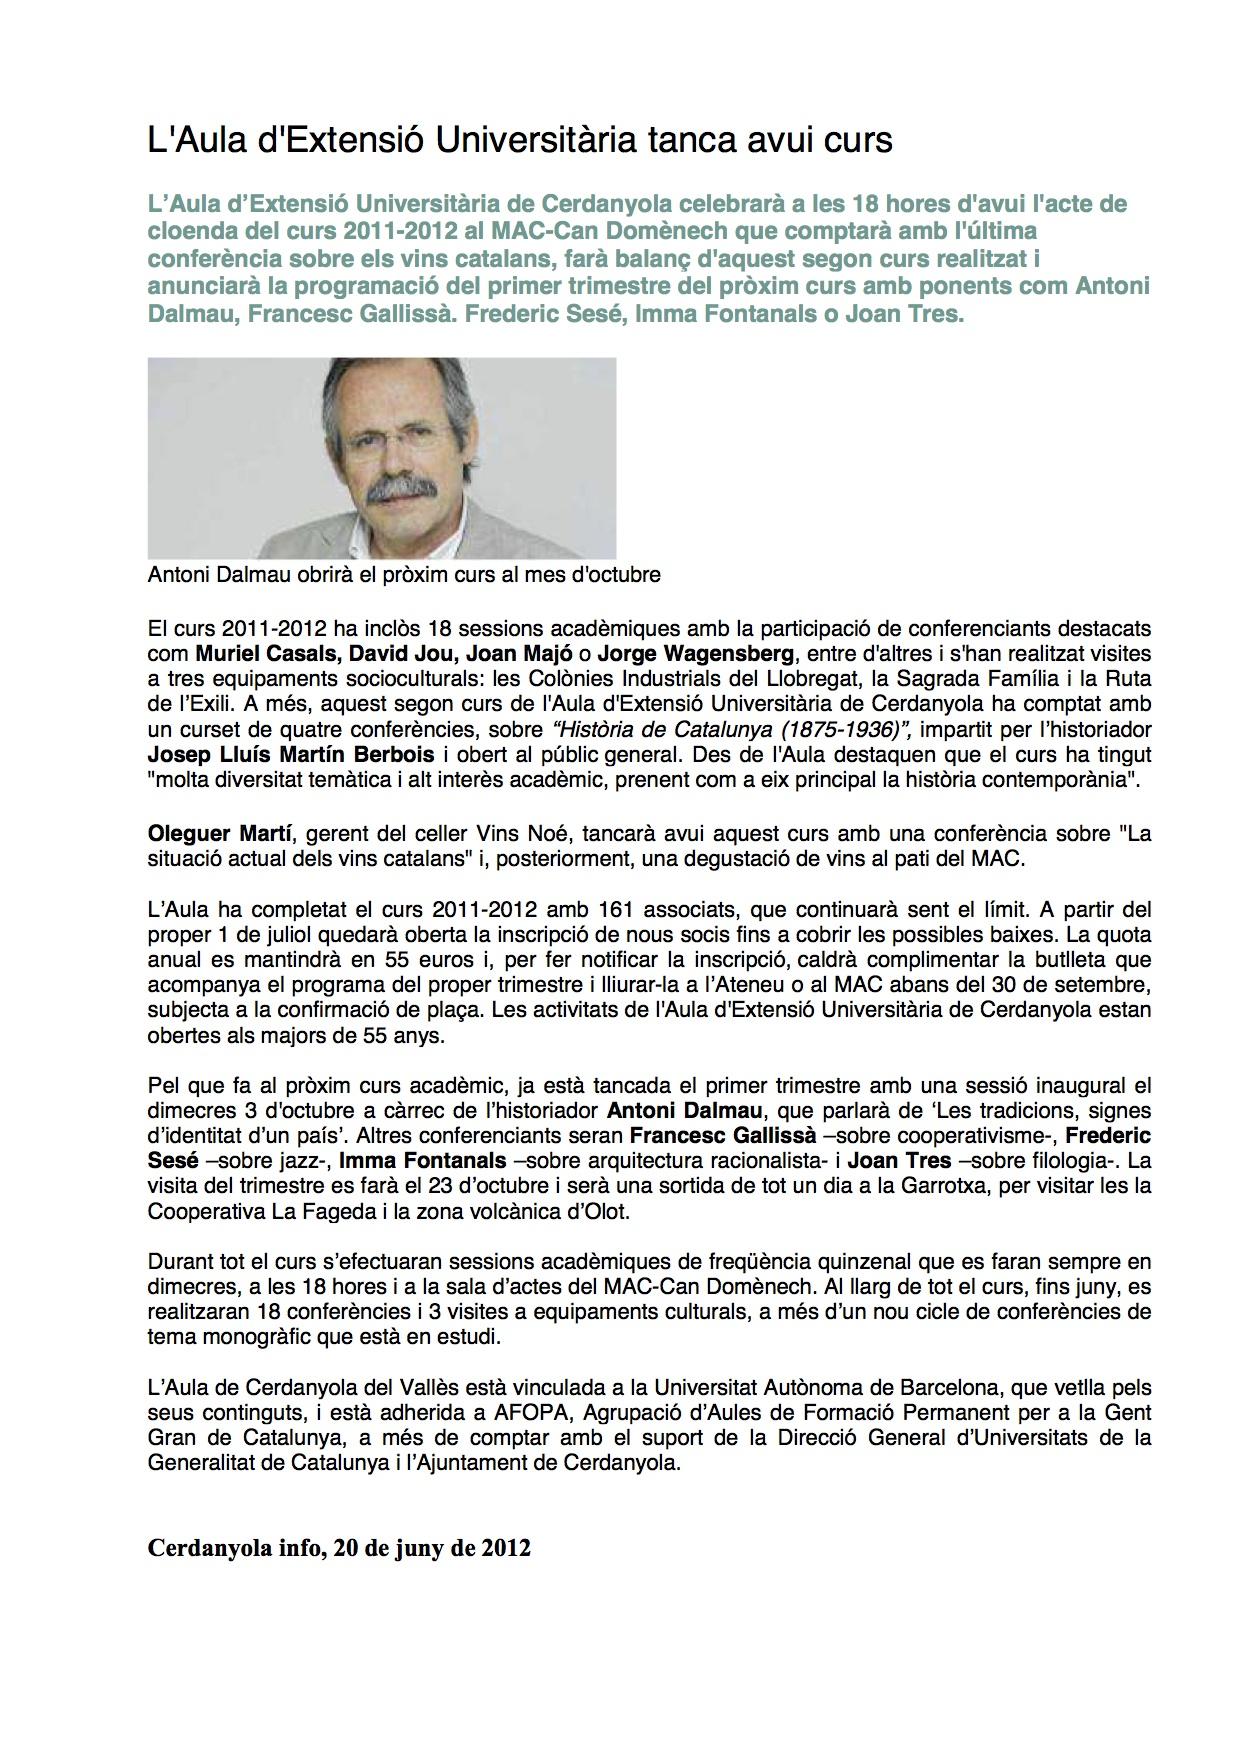 Cerdanyola info 20-06-12 (2)